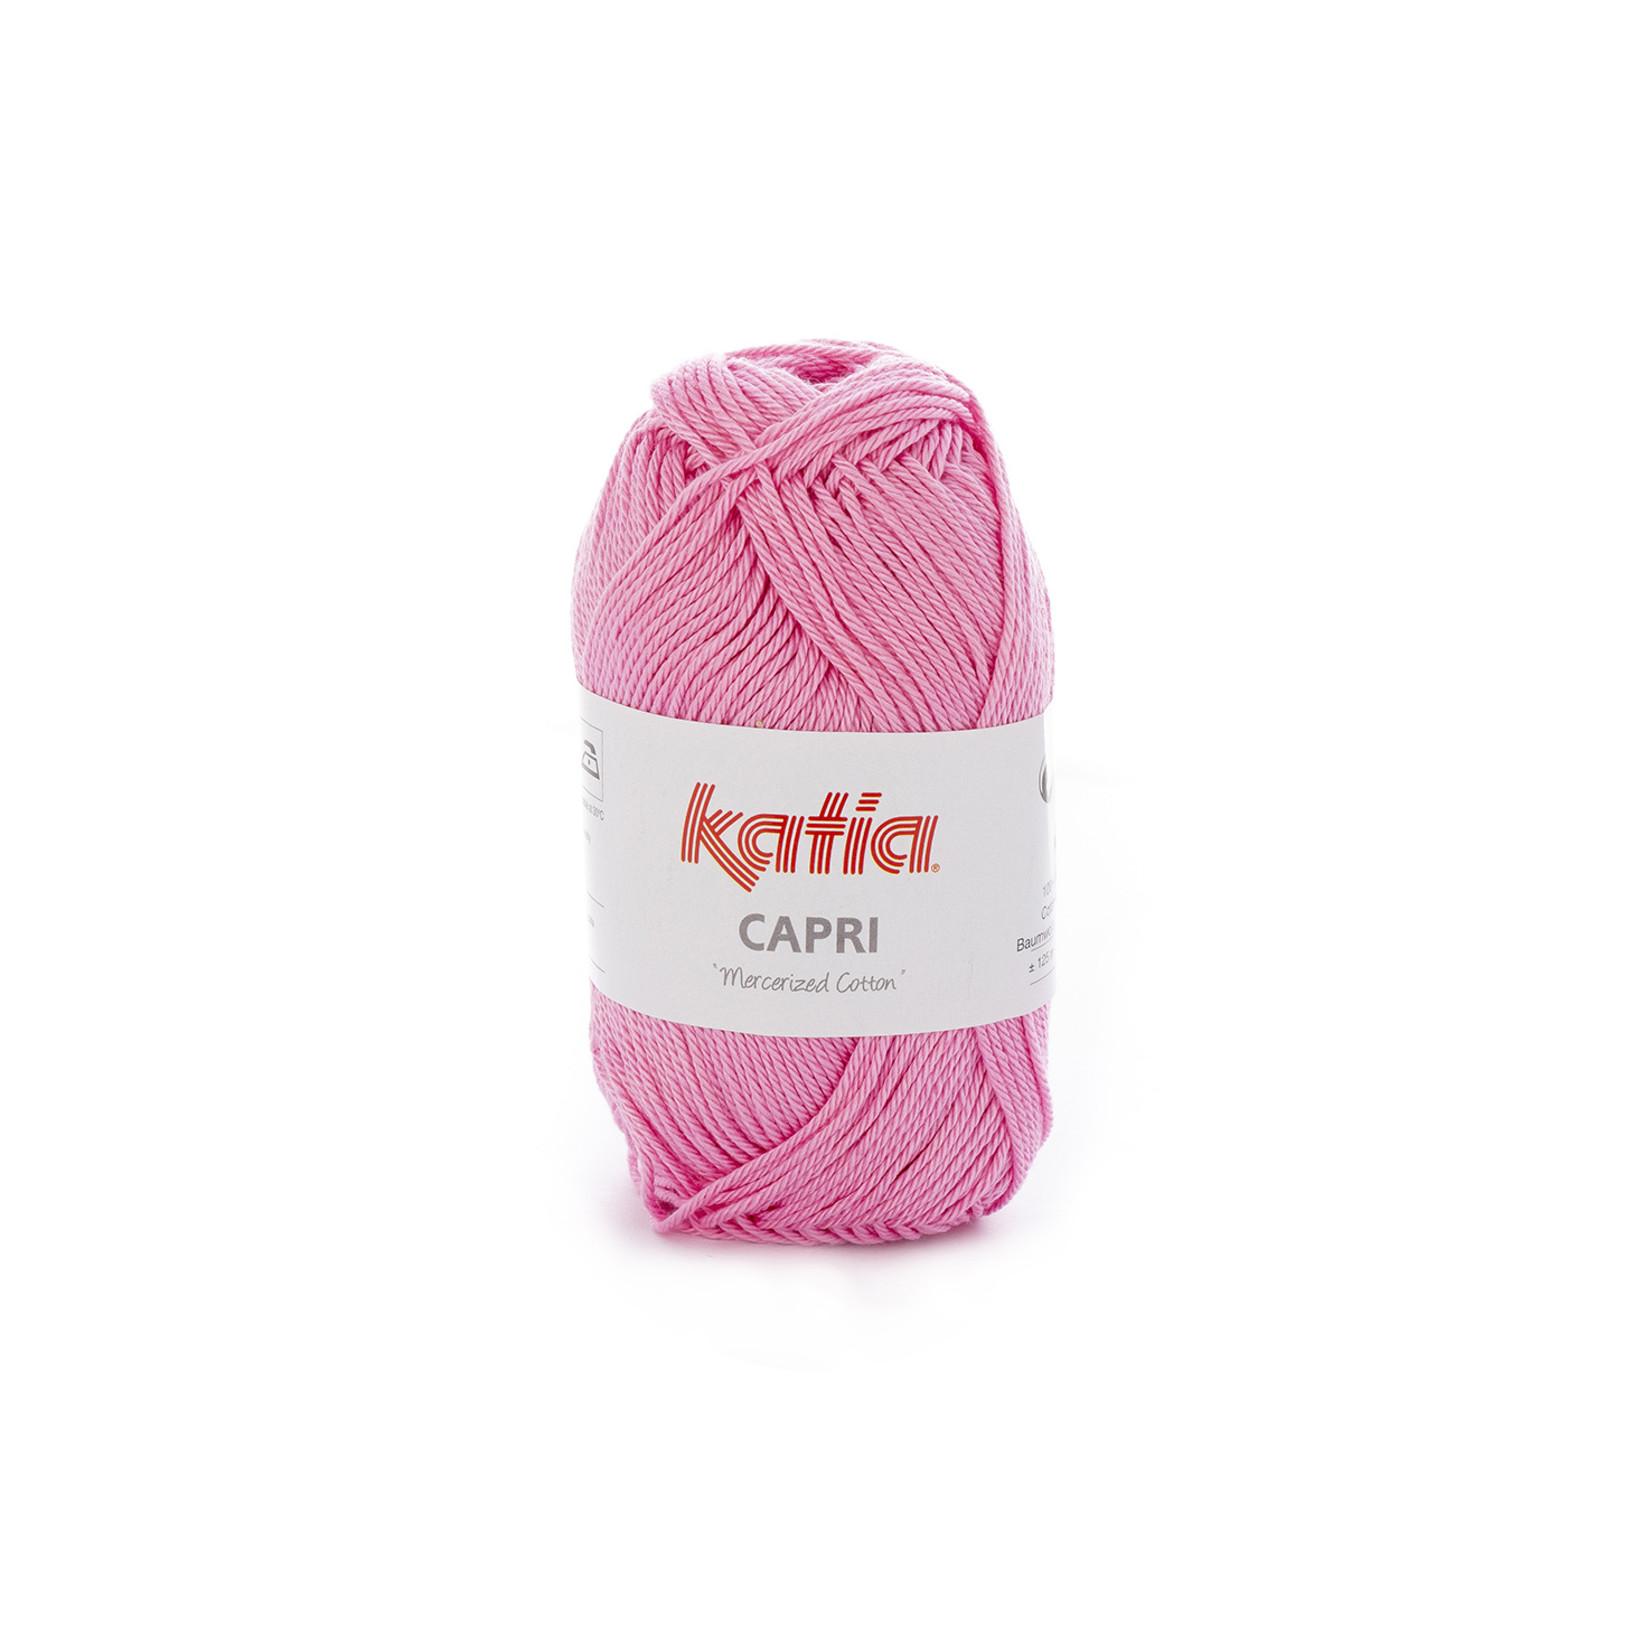 Katia Katia Capri - kleur 100 Bleekrood - 50 gr. = 125 m. - 100% katoen